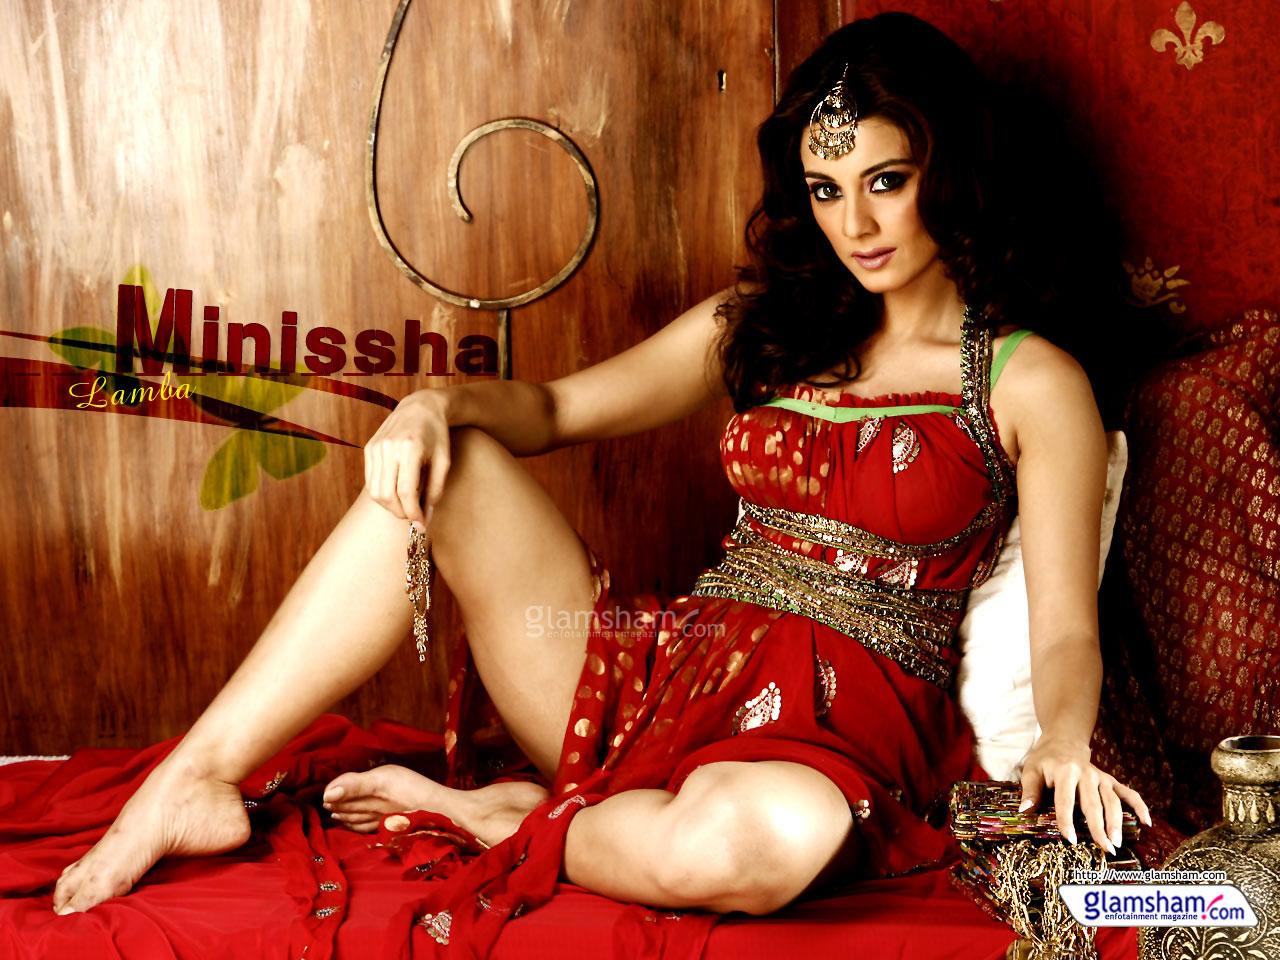 bollywood actresses hd wallpapers bollywood actresses hd wallpapers 1280x960